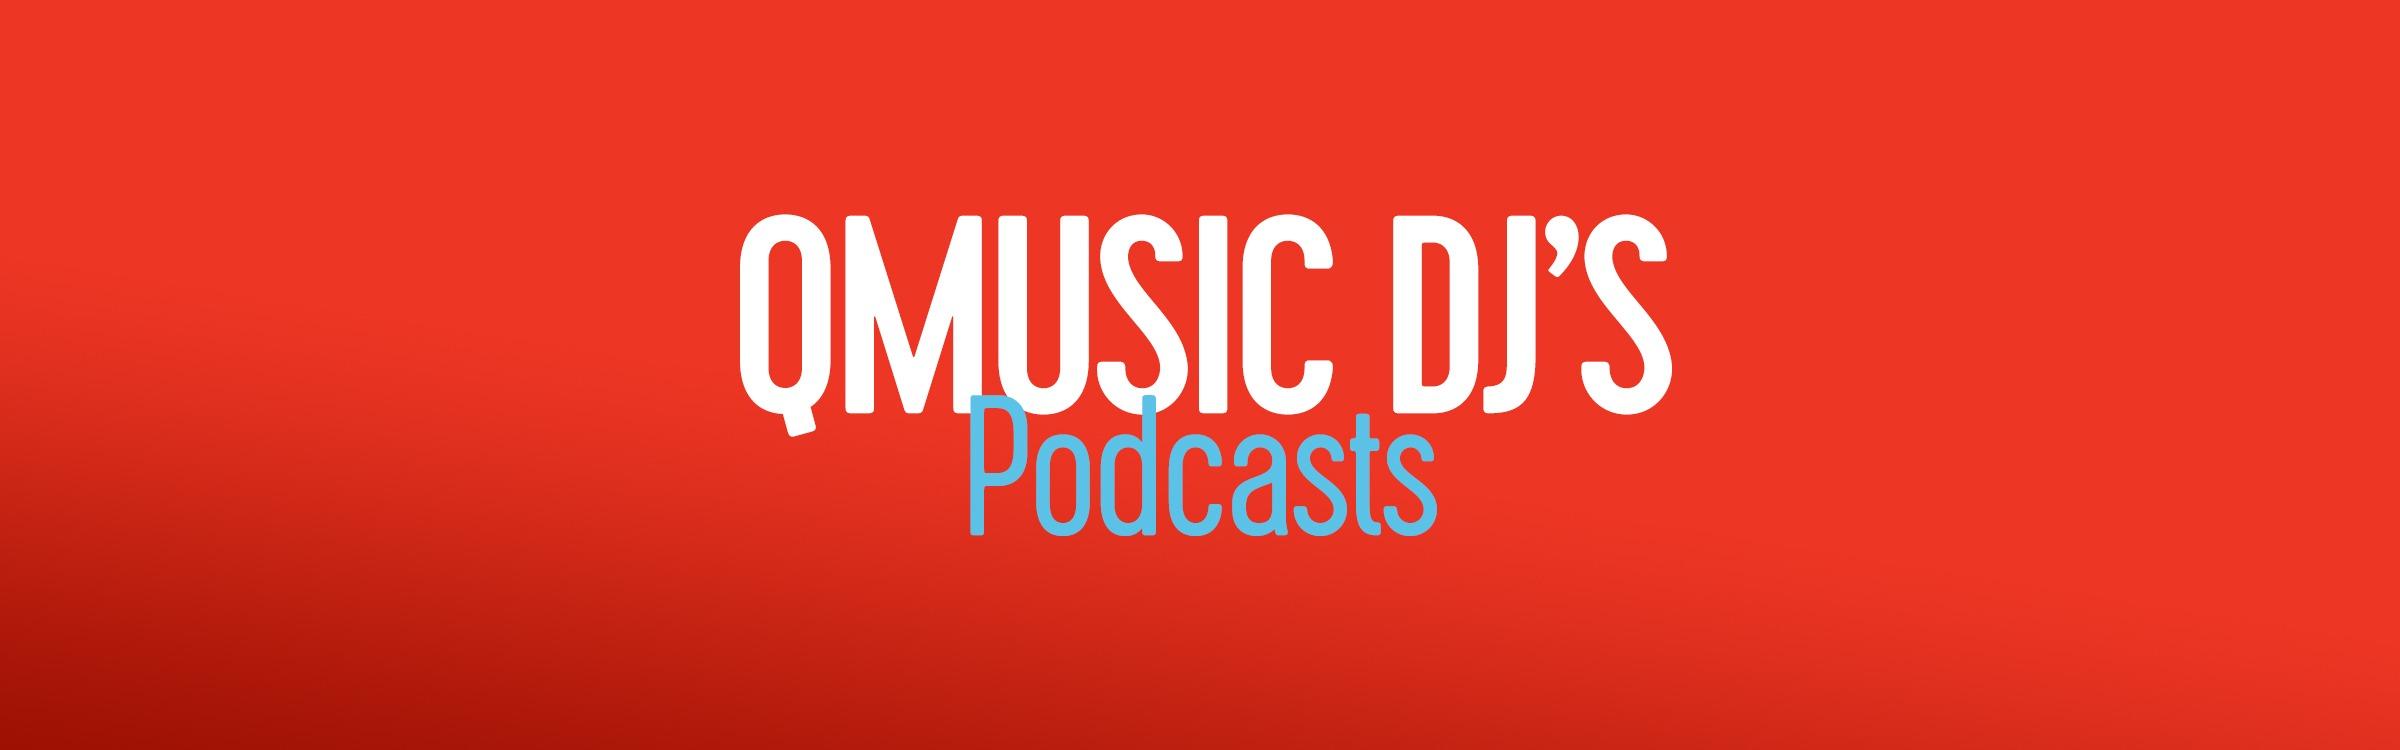 Qmusic actionheader qpodcast